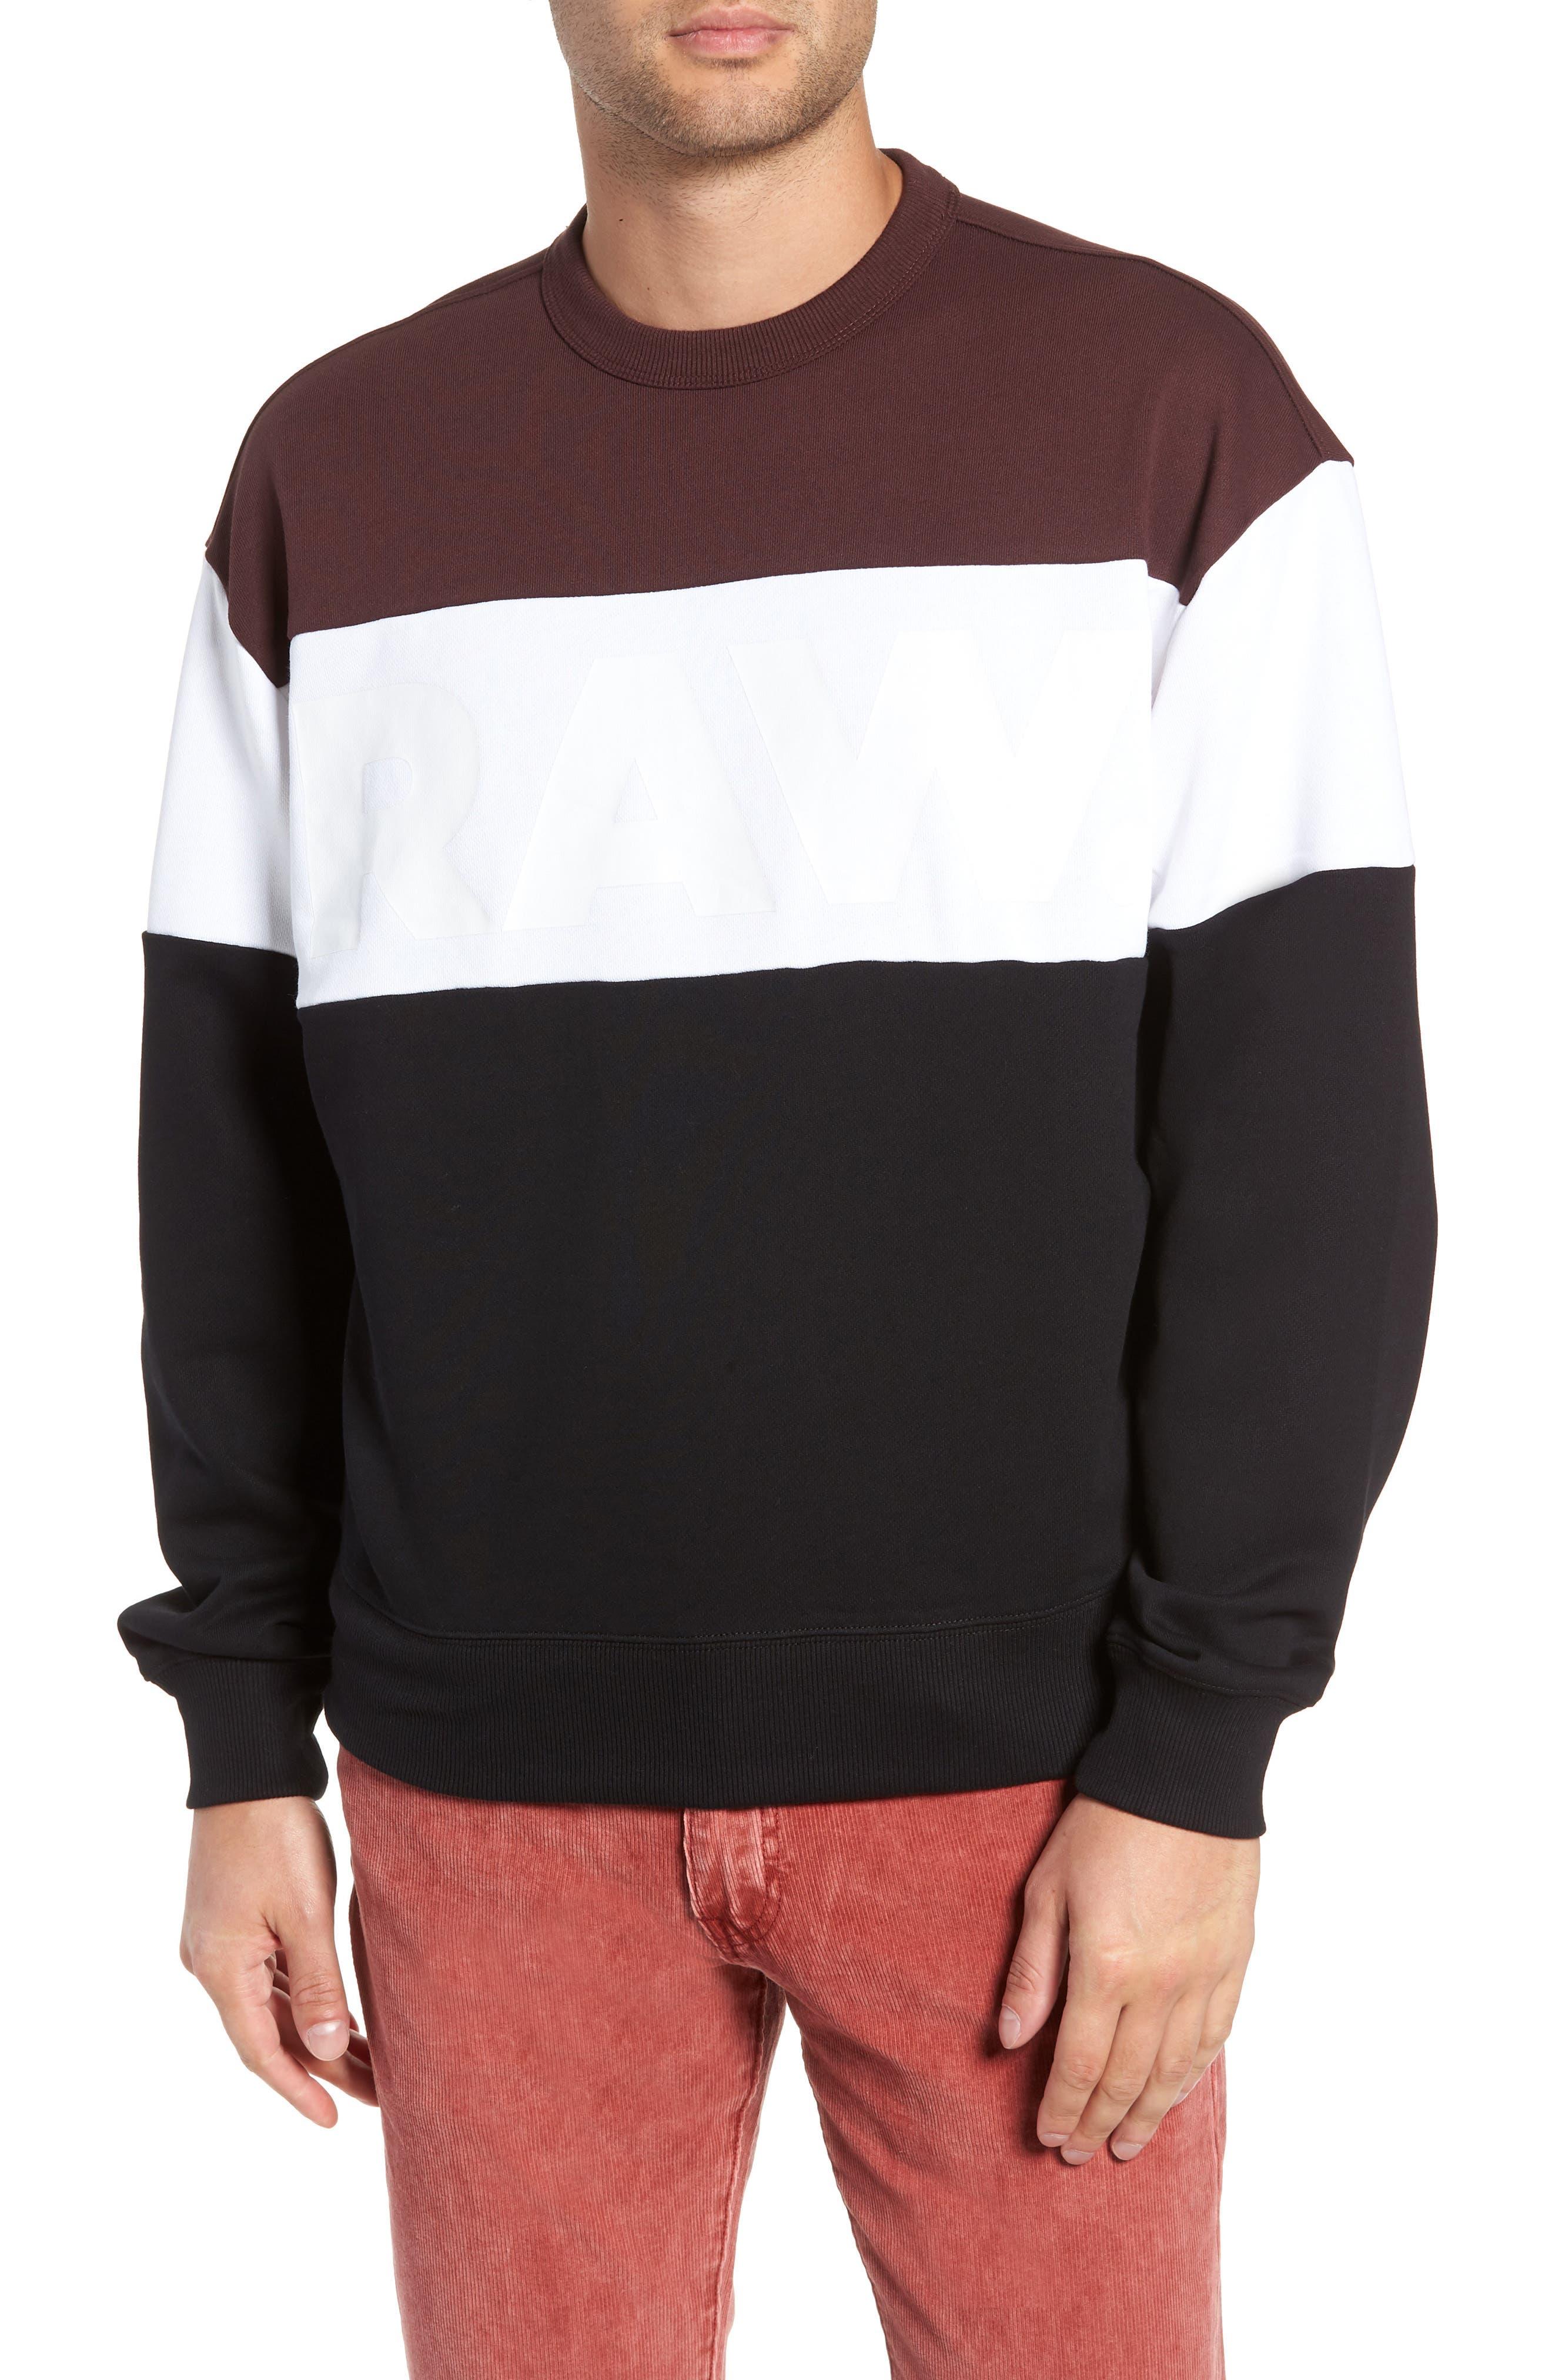 Libe Core Colorblock Sweatshirt,                         Main,                         color, 001